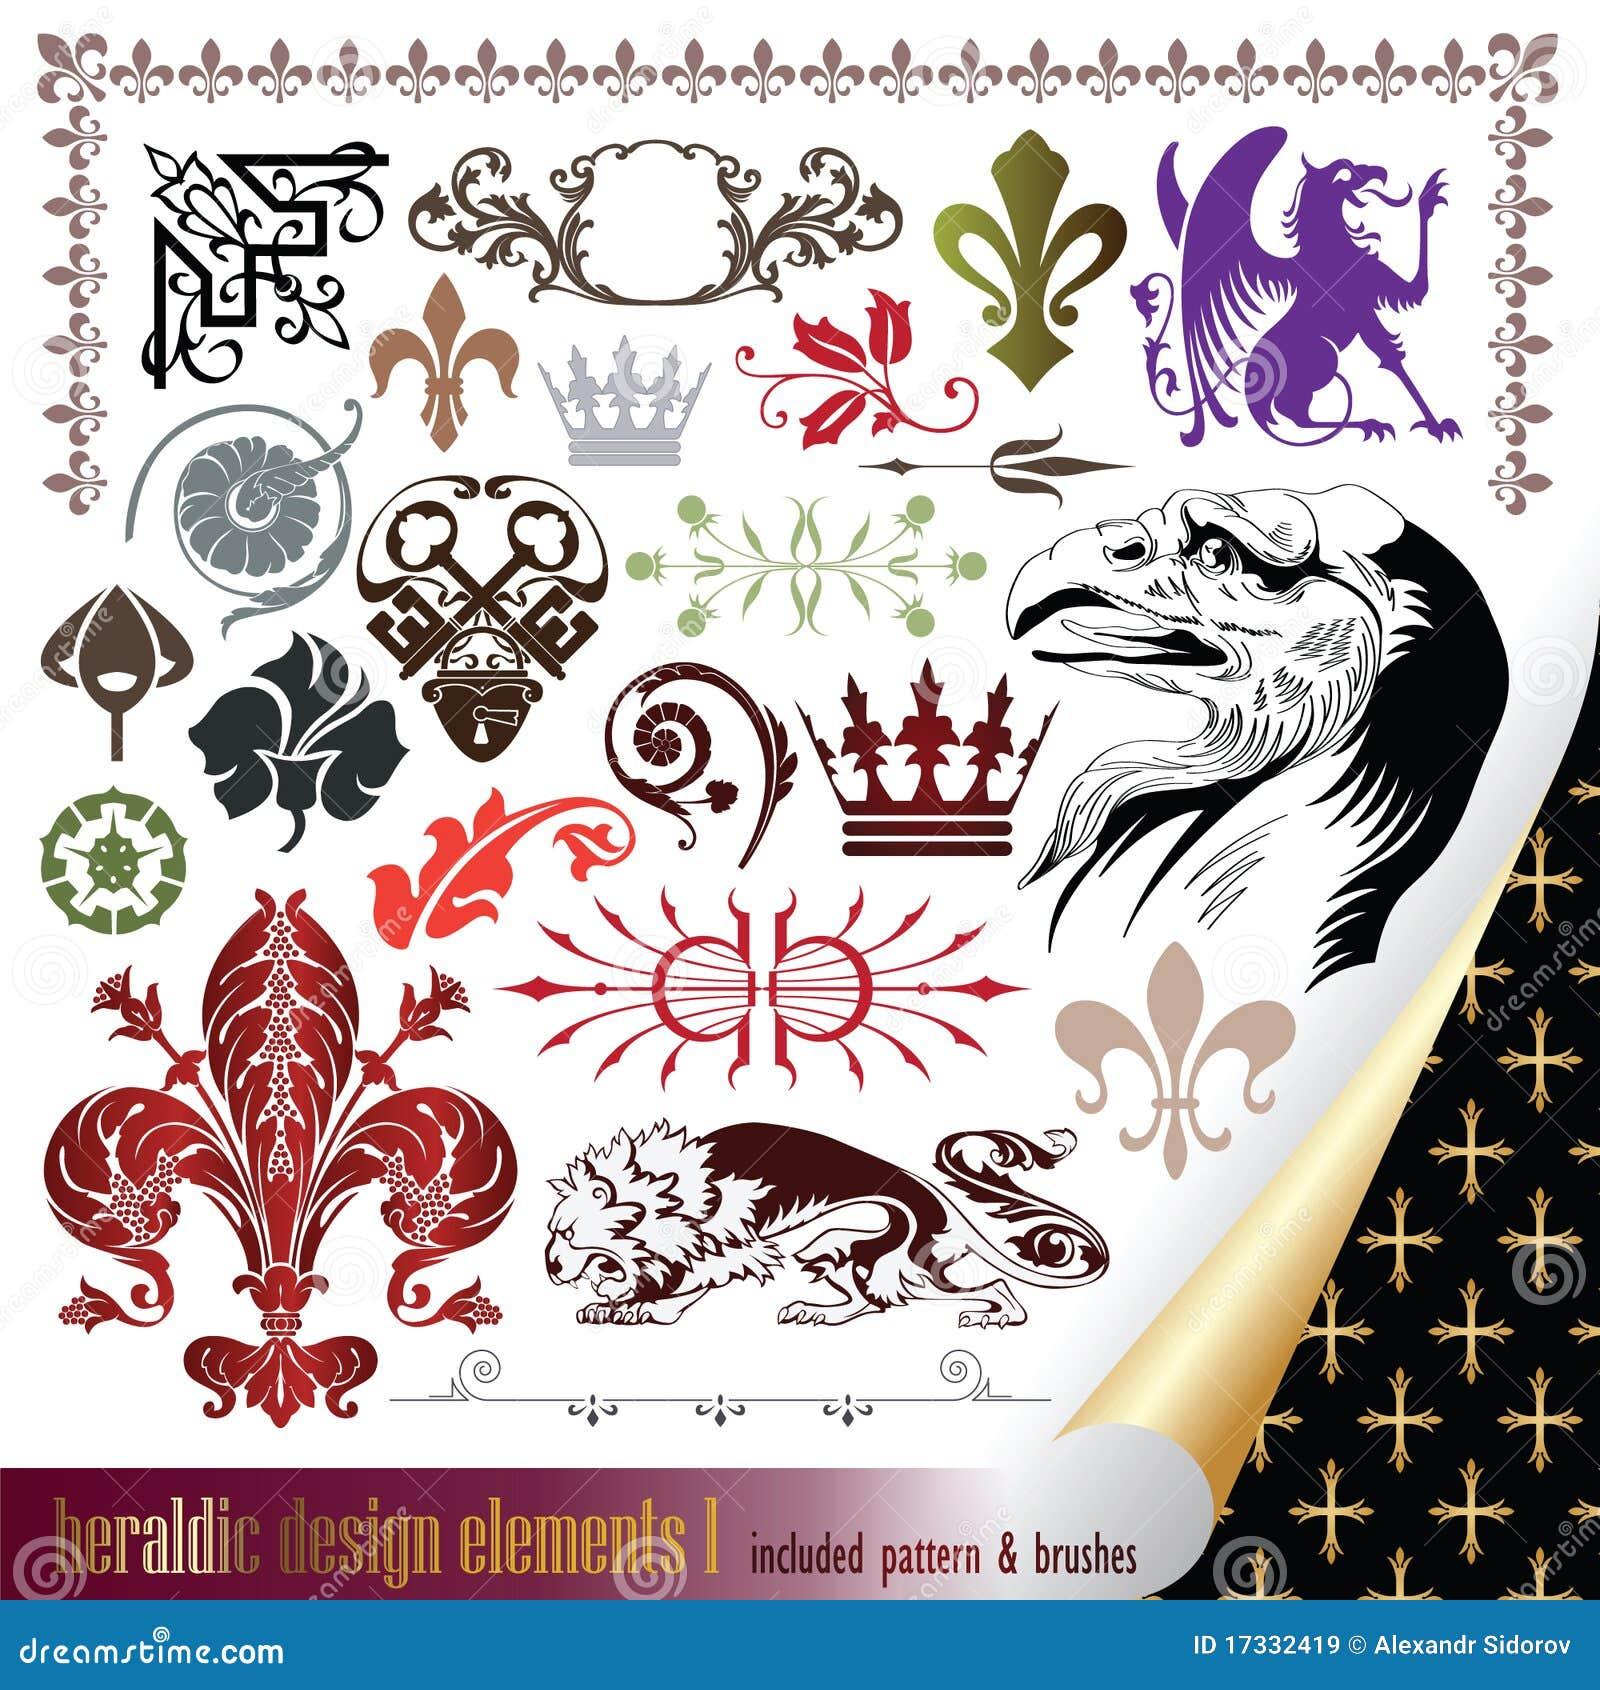 Elements for your heraldic design